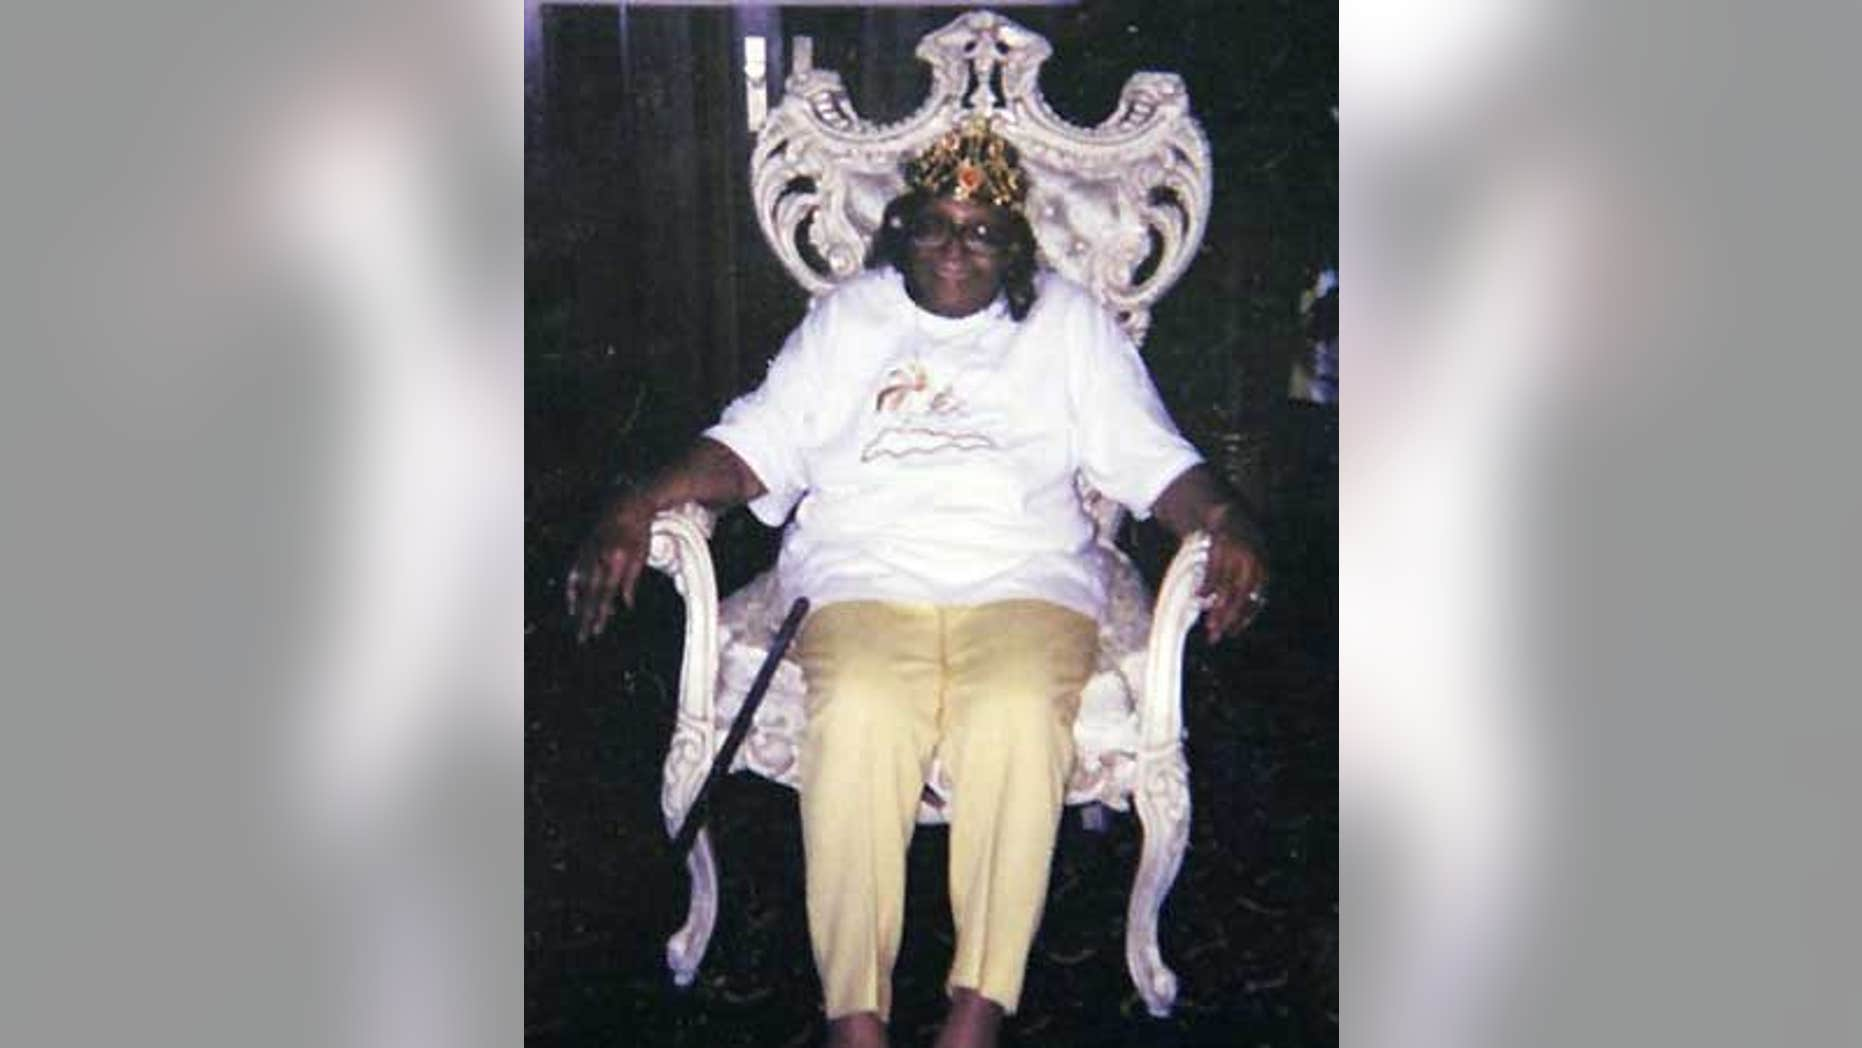 Kathryn Johnston, 92, was killed during a botched police raid in Georgia.